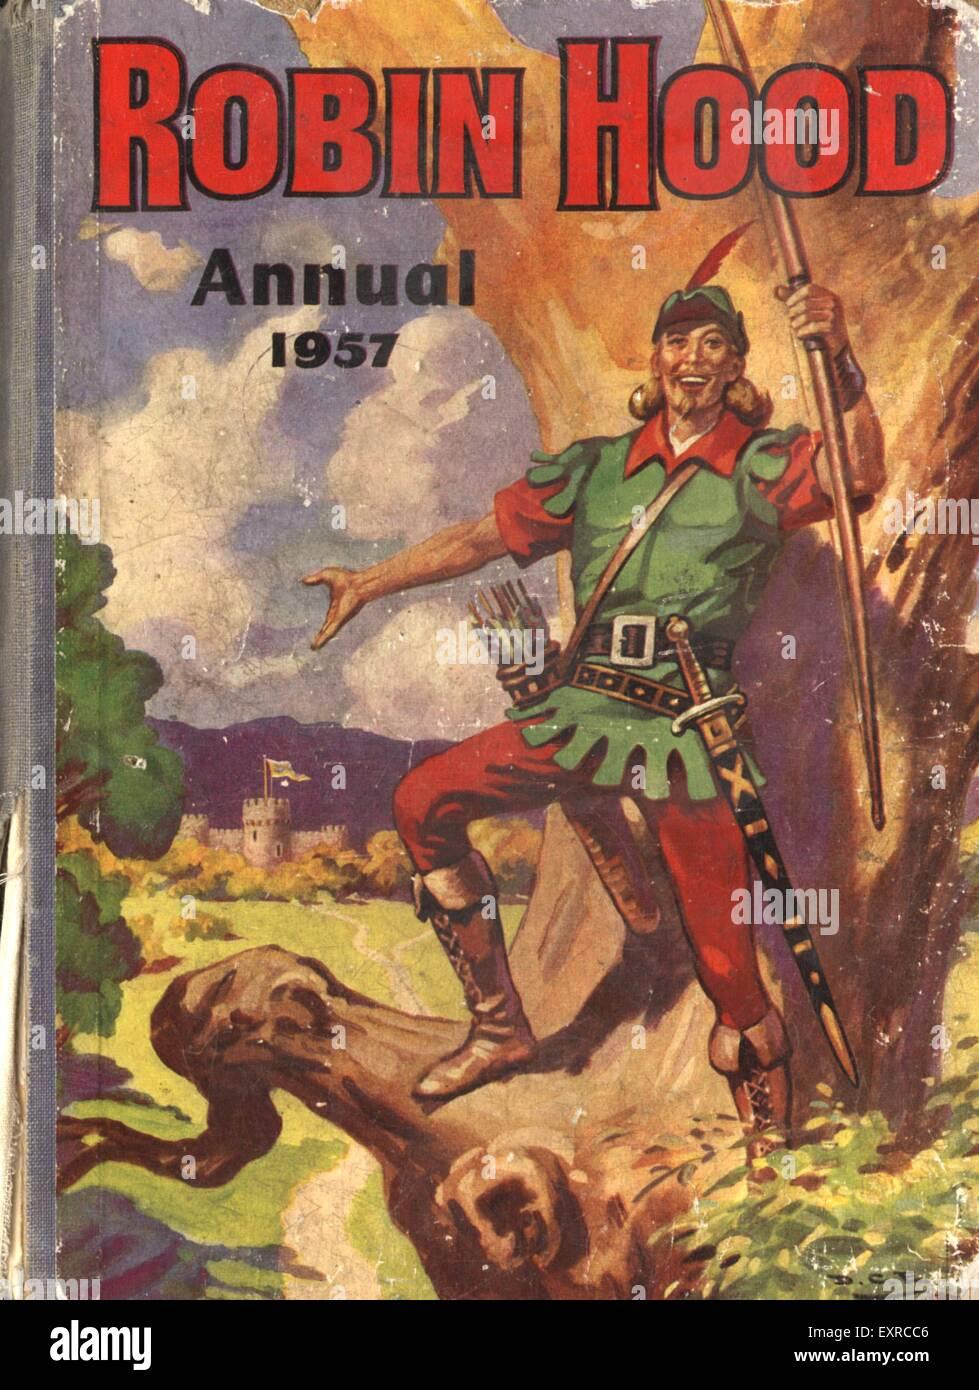 1950s UK Robin Hood Comic/ Annual Cover - Stock Image